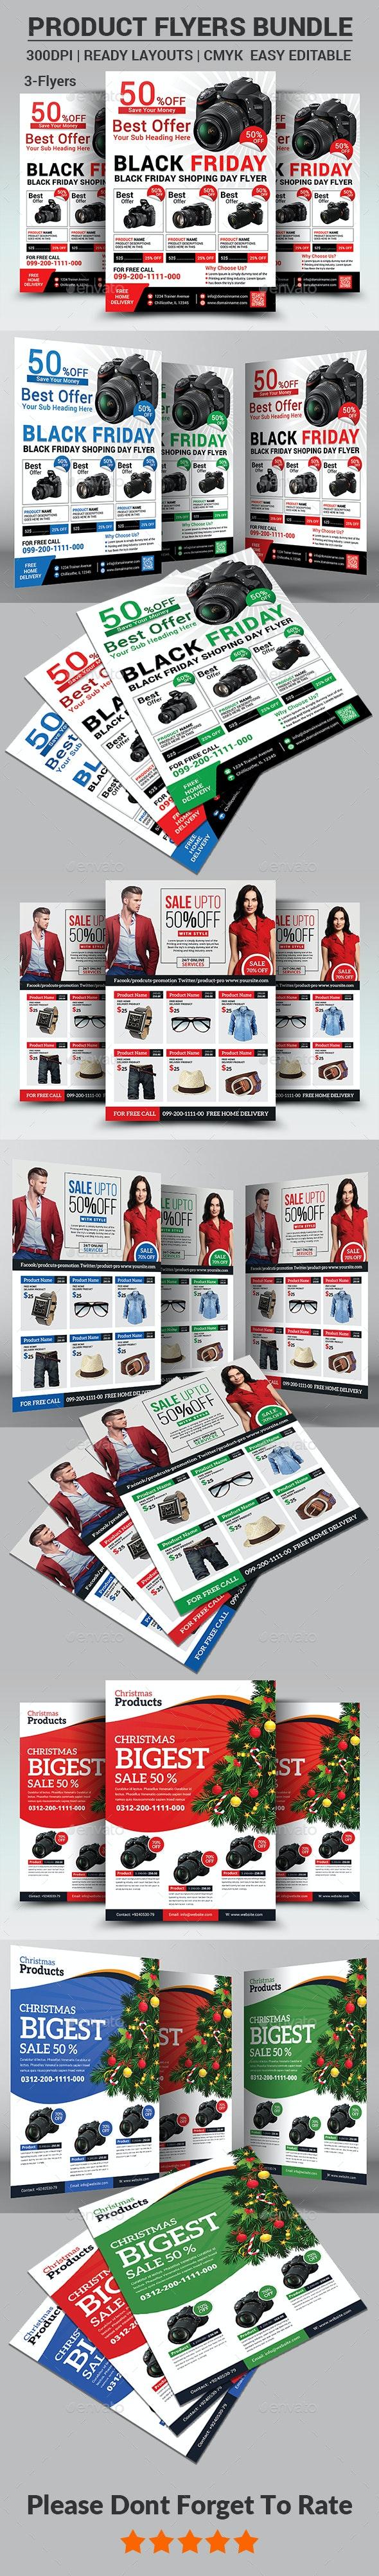 Product Promotion Flyers Bundle - Corporate Flyers